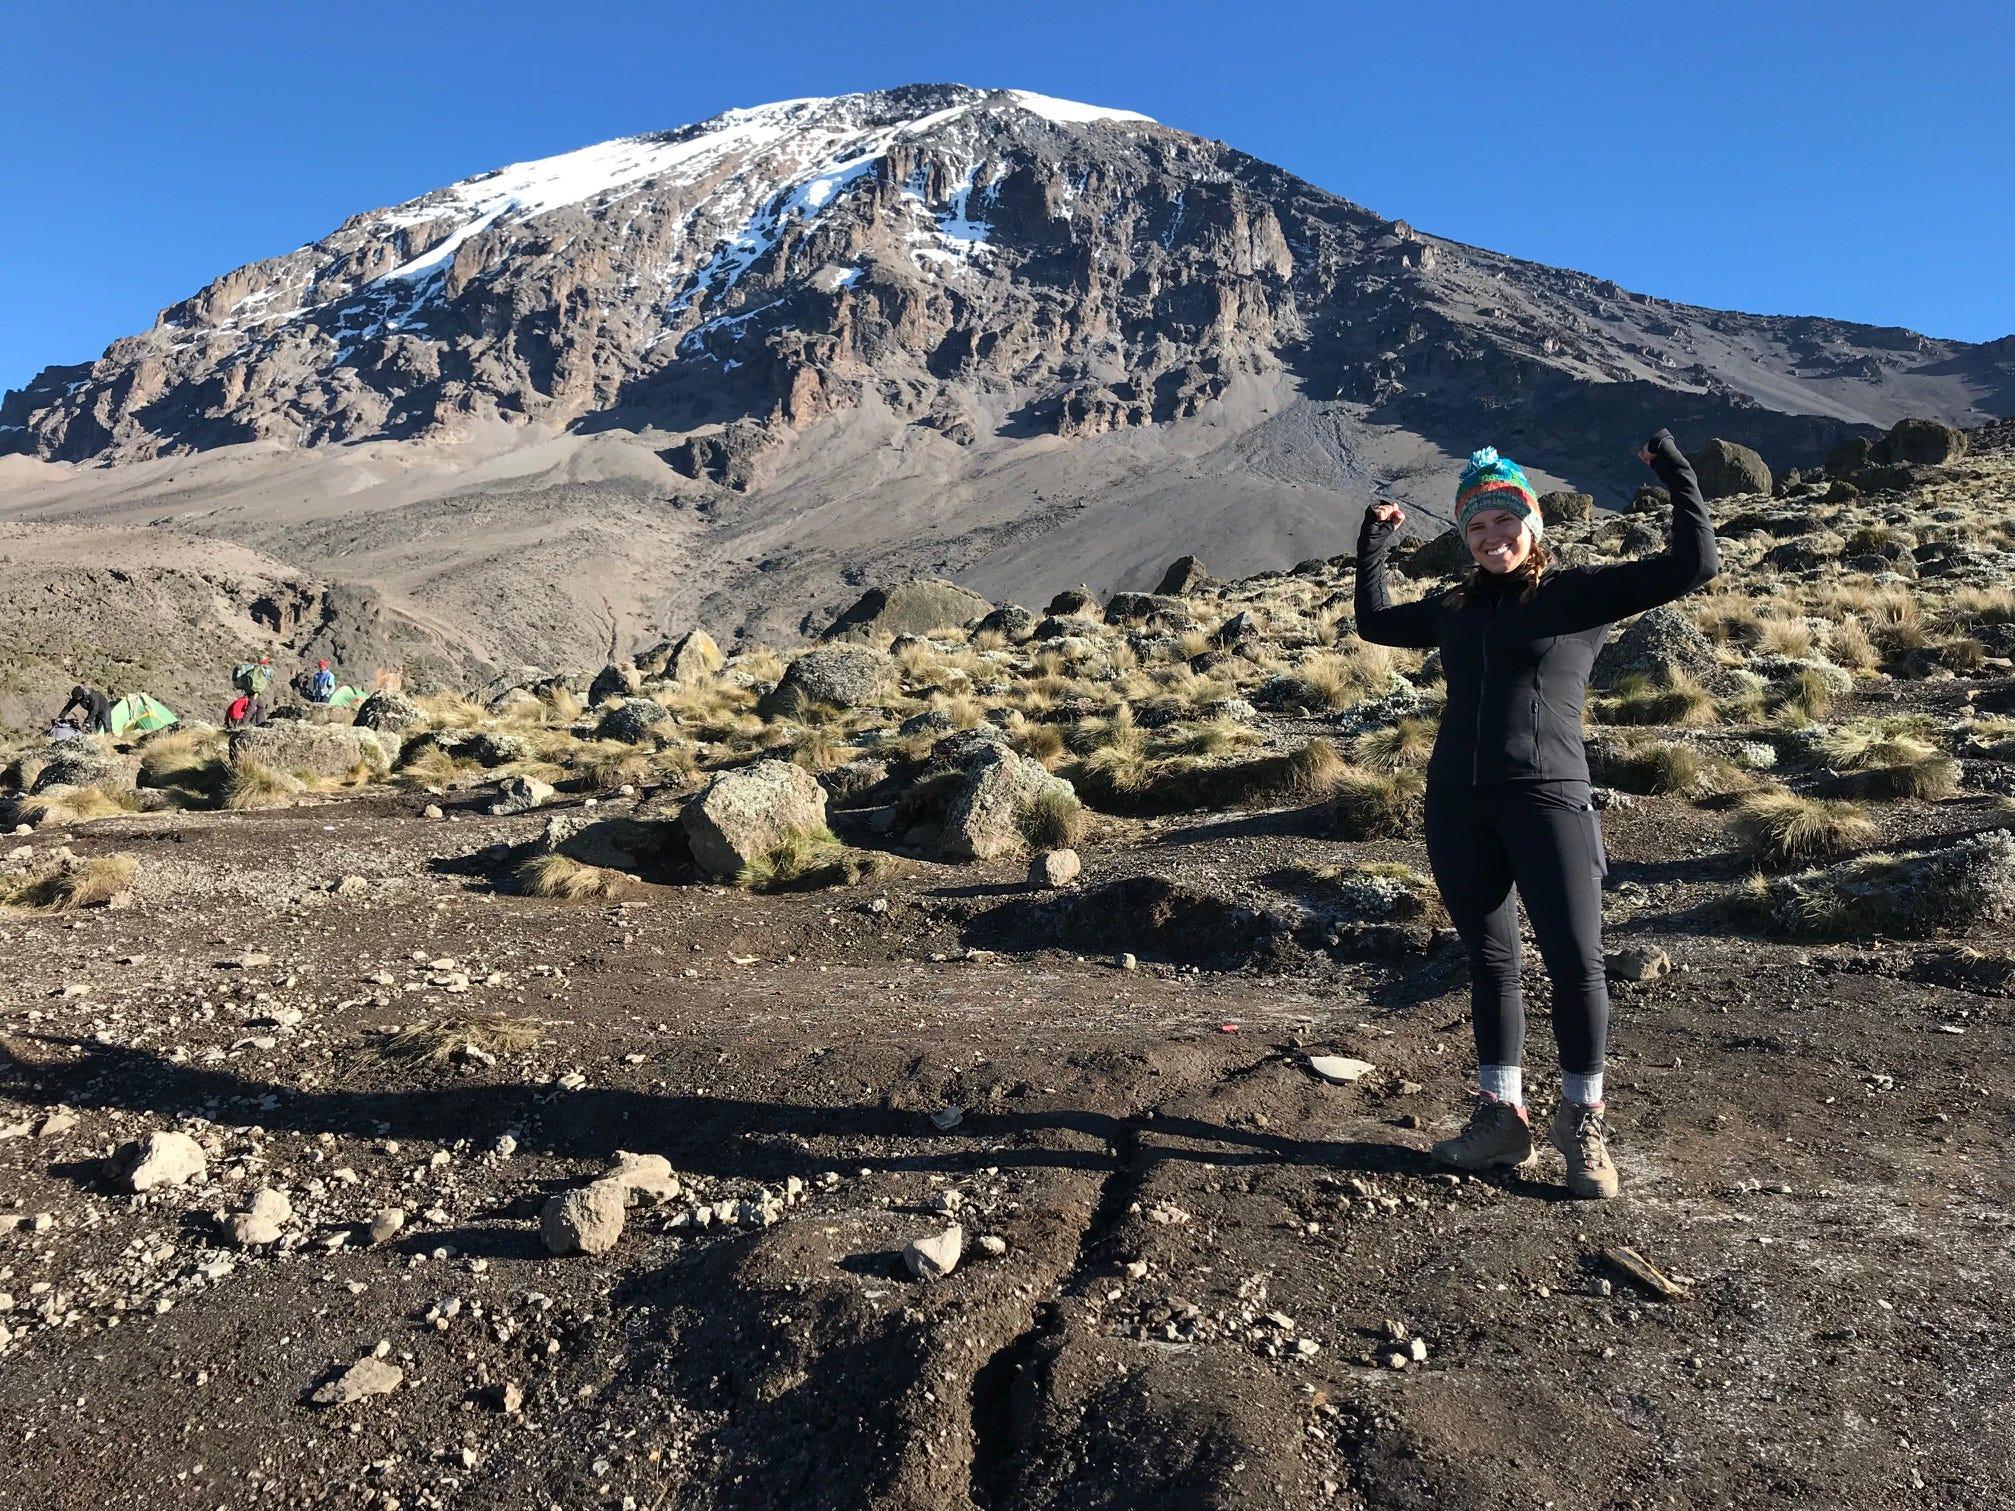 Elliott Grantz on Mount Kilimanjaro, Tanzania